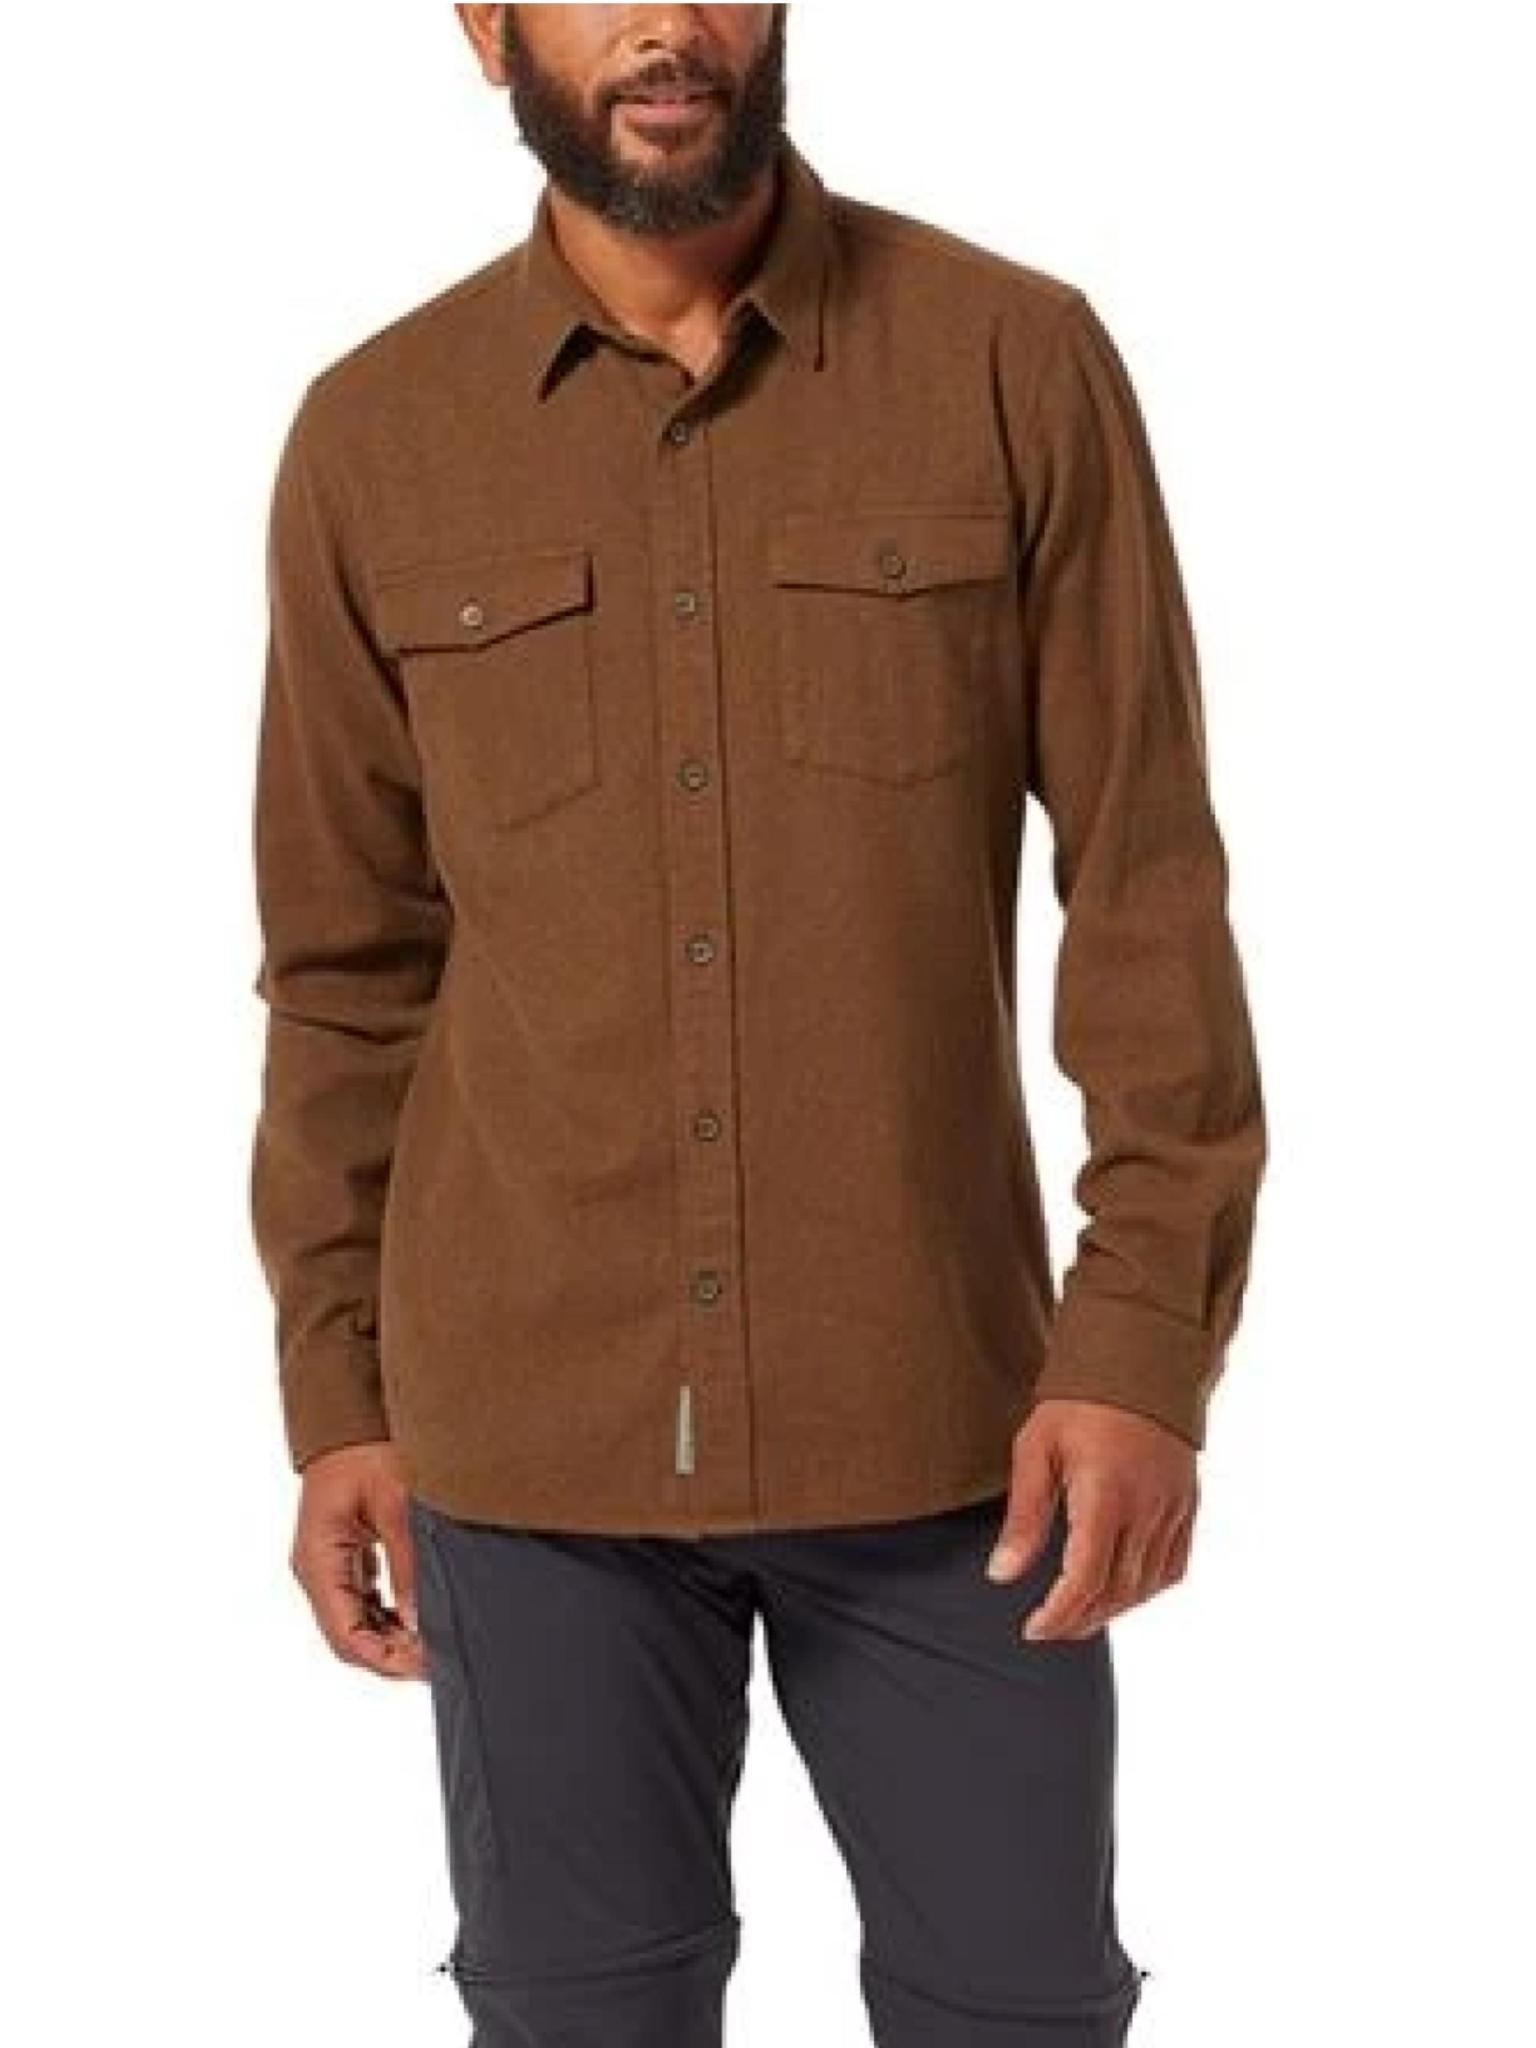 Royal Robbins Men's Bristol Organic Cotton Twill Long Sleeve